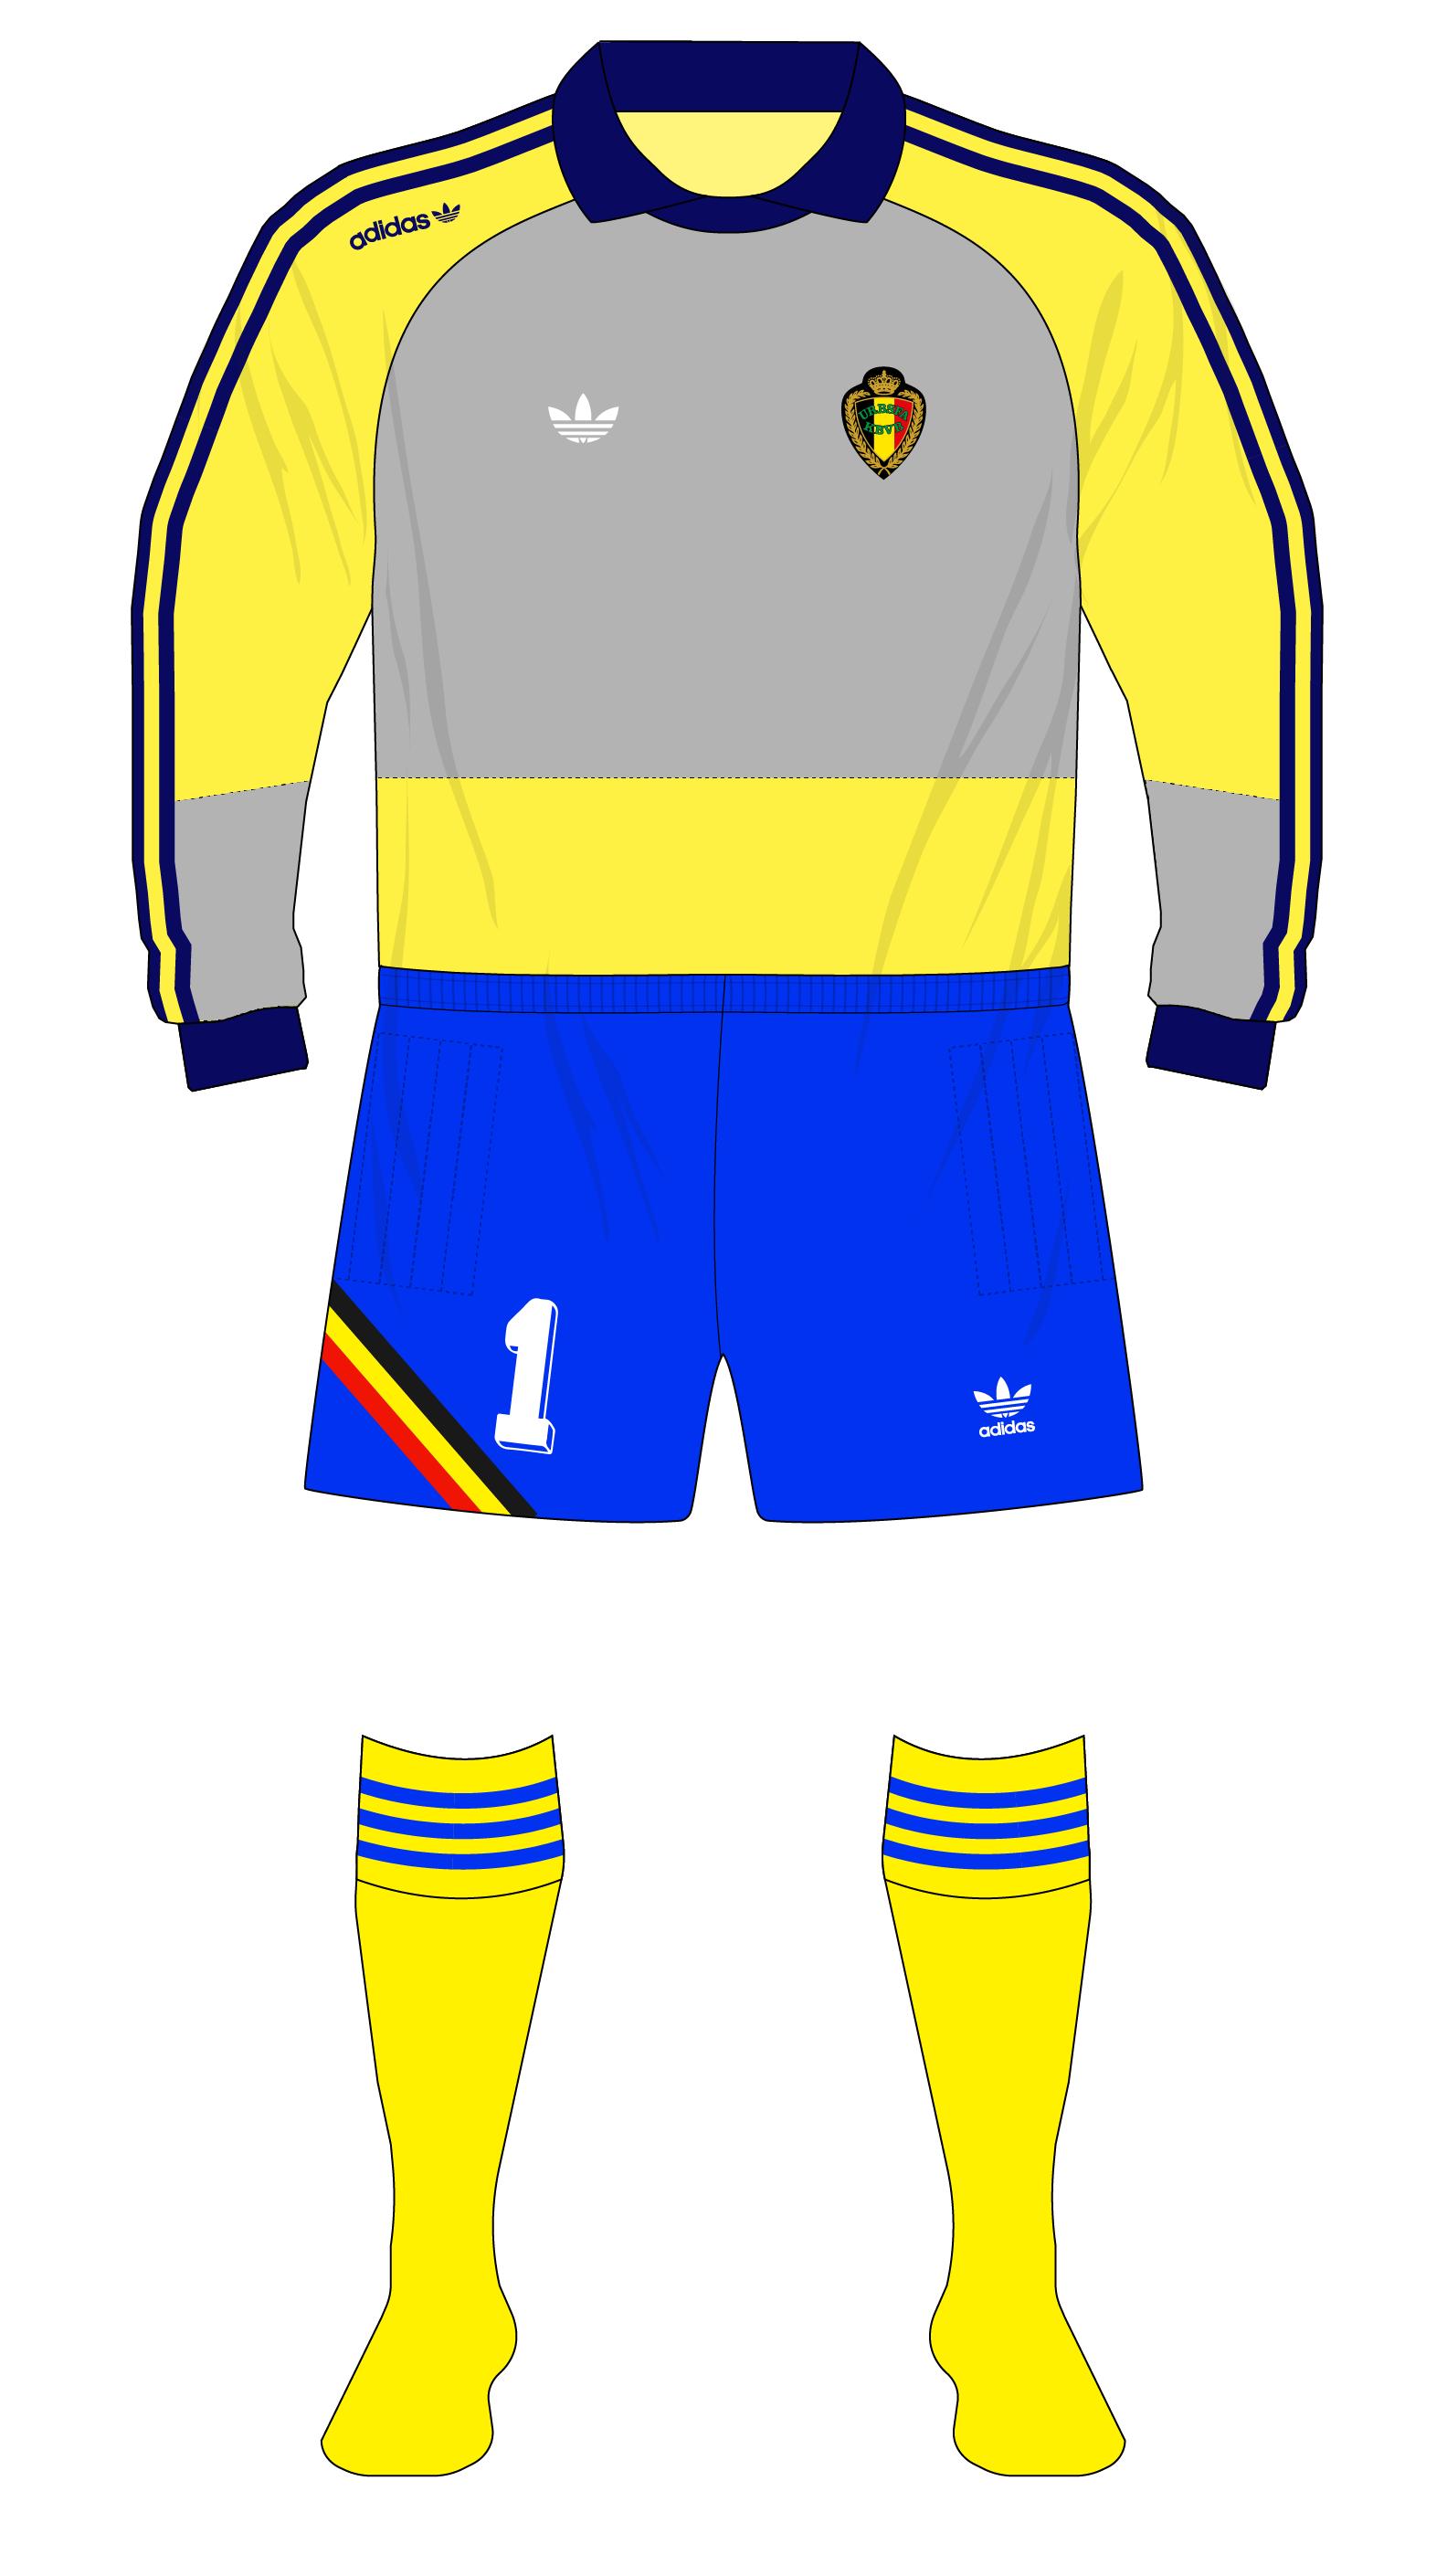 59b634399 Belgium-1990-adidas-goalkeeper-shirt-World-Cup-Preud homme-yellow-01 ...